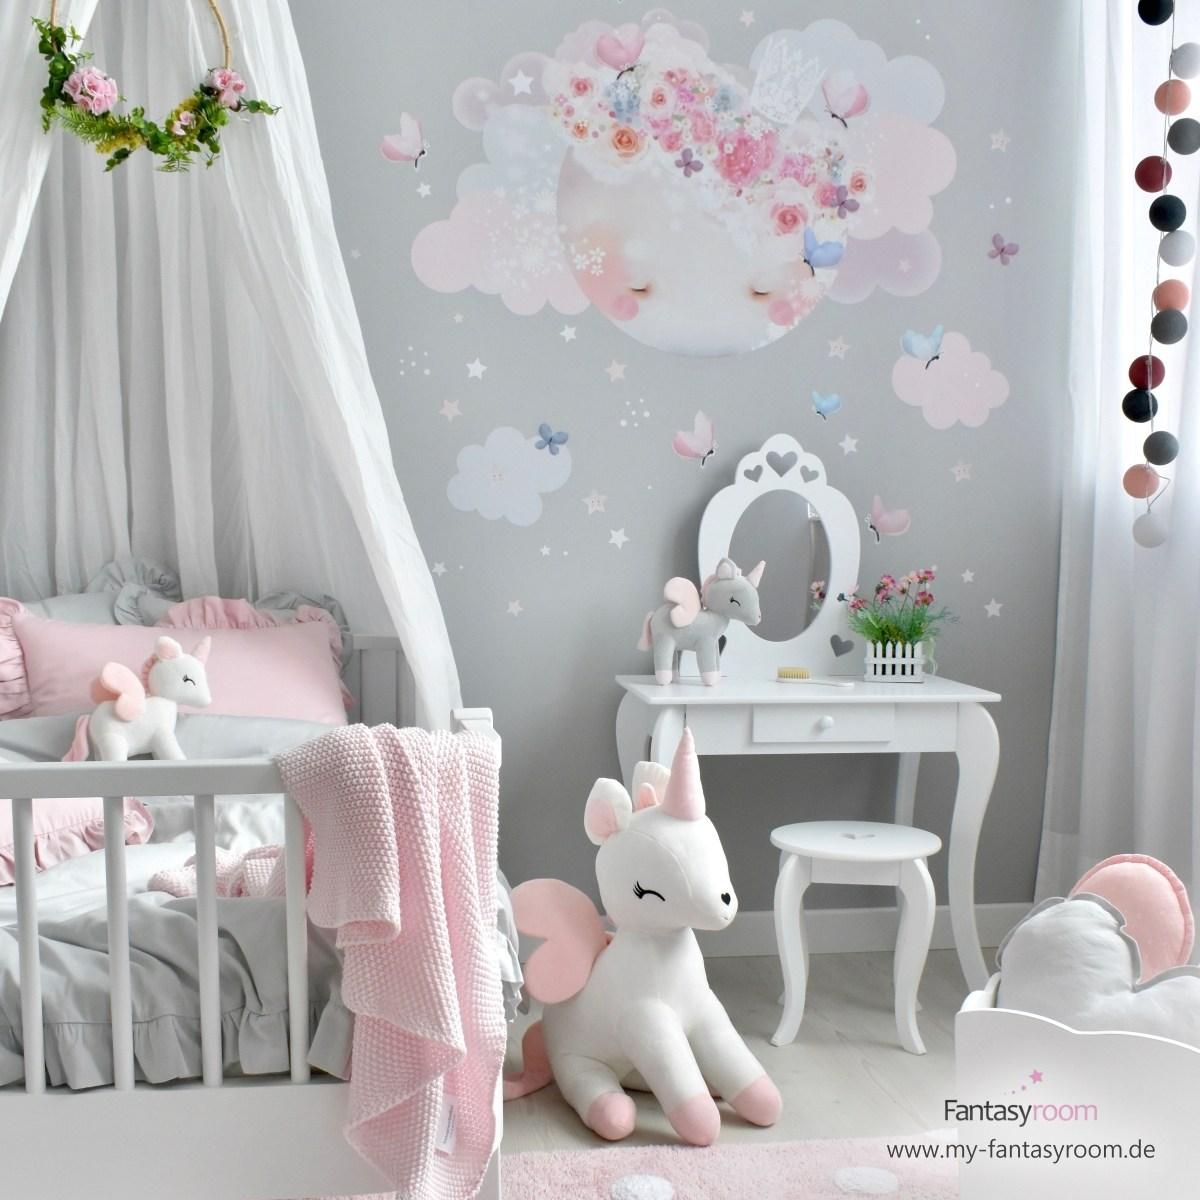 Full Size of Kinderzimmer Prinzessin Fantasyroom Rosa Grau 190804 Regal Sofa Regale Bett Prinzessinen Weiß Kinderzimmer Kinderzimmer Prinzessin